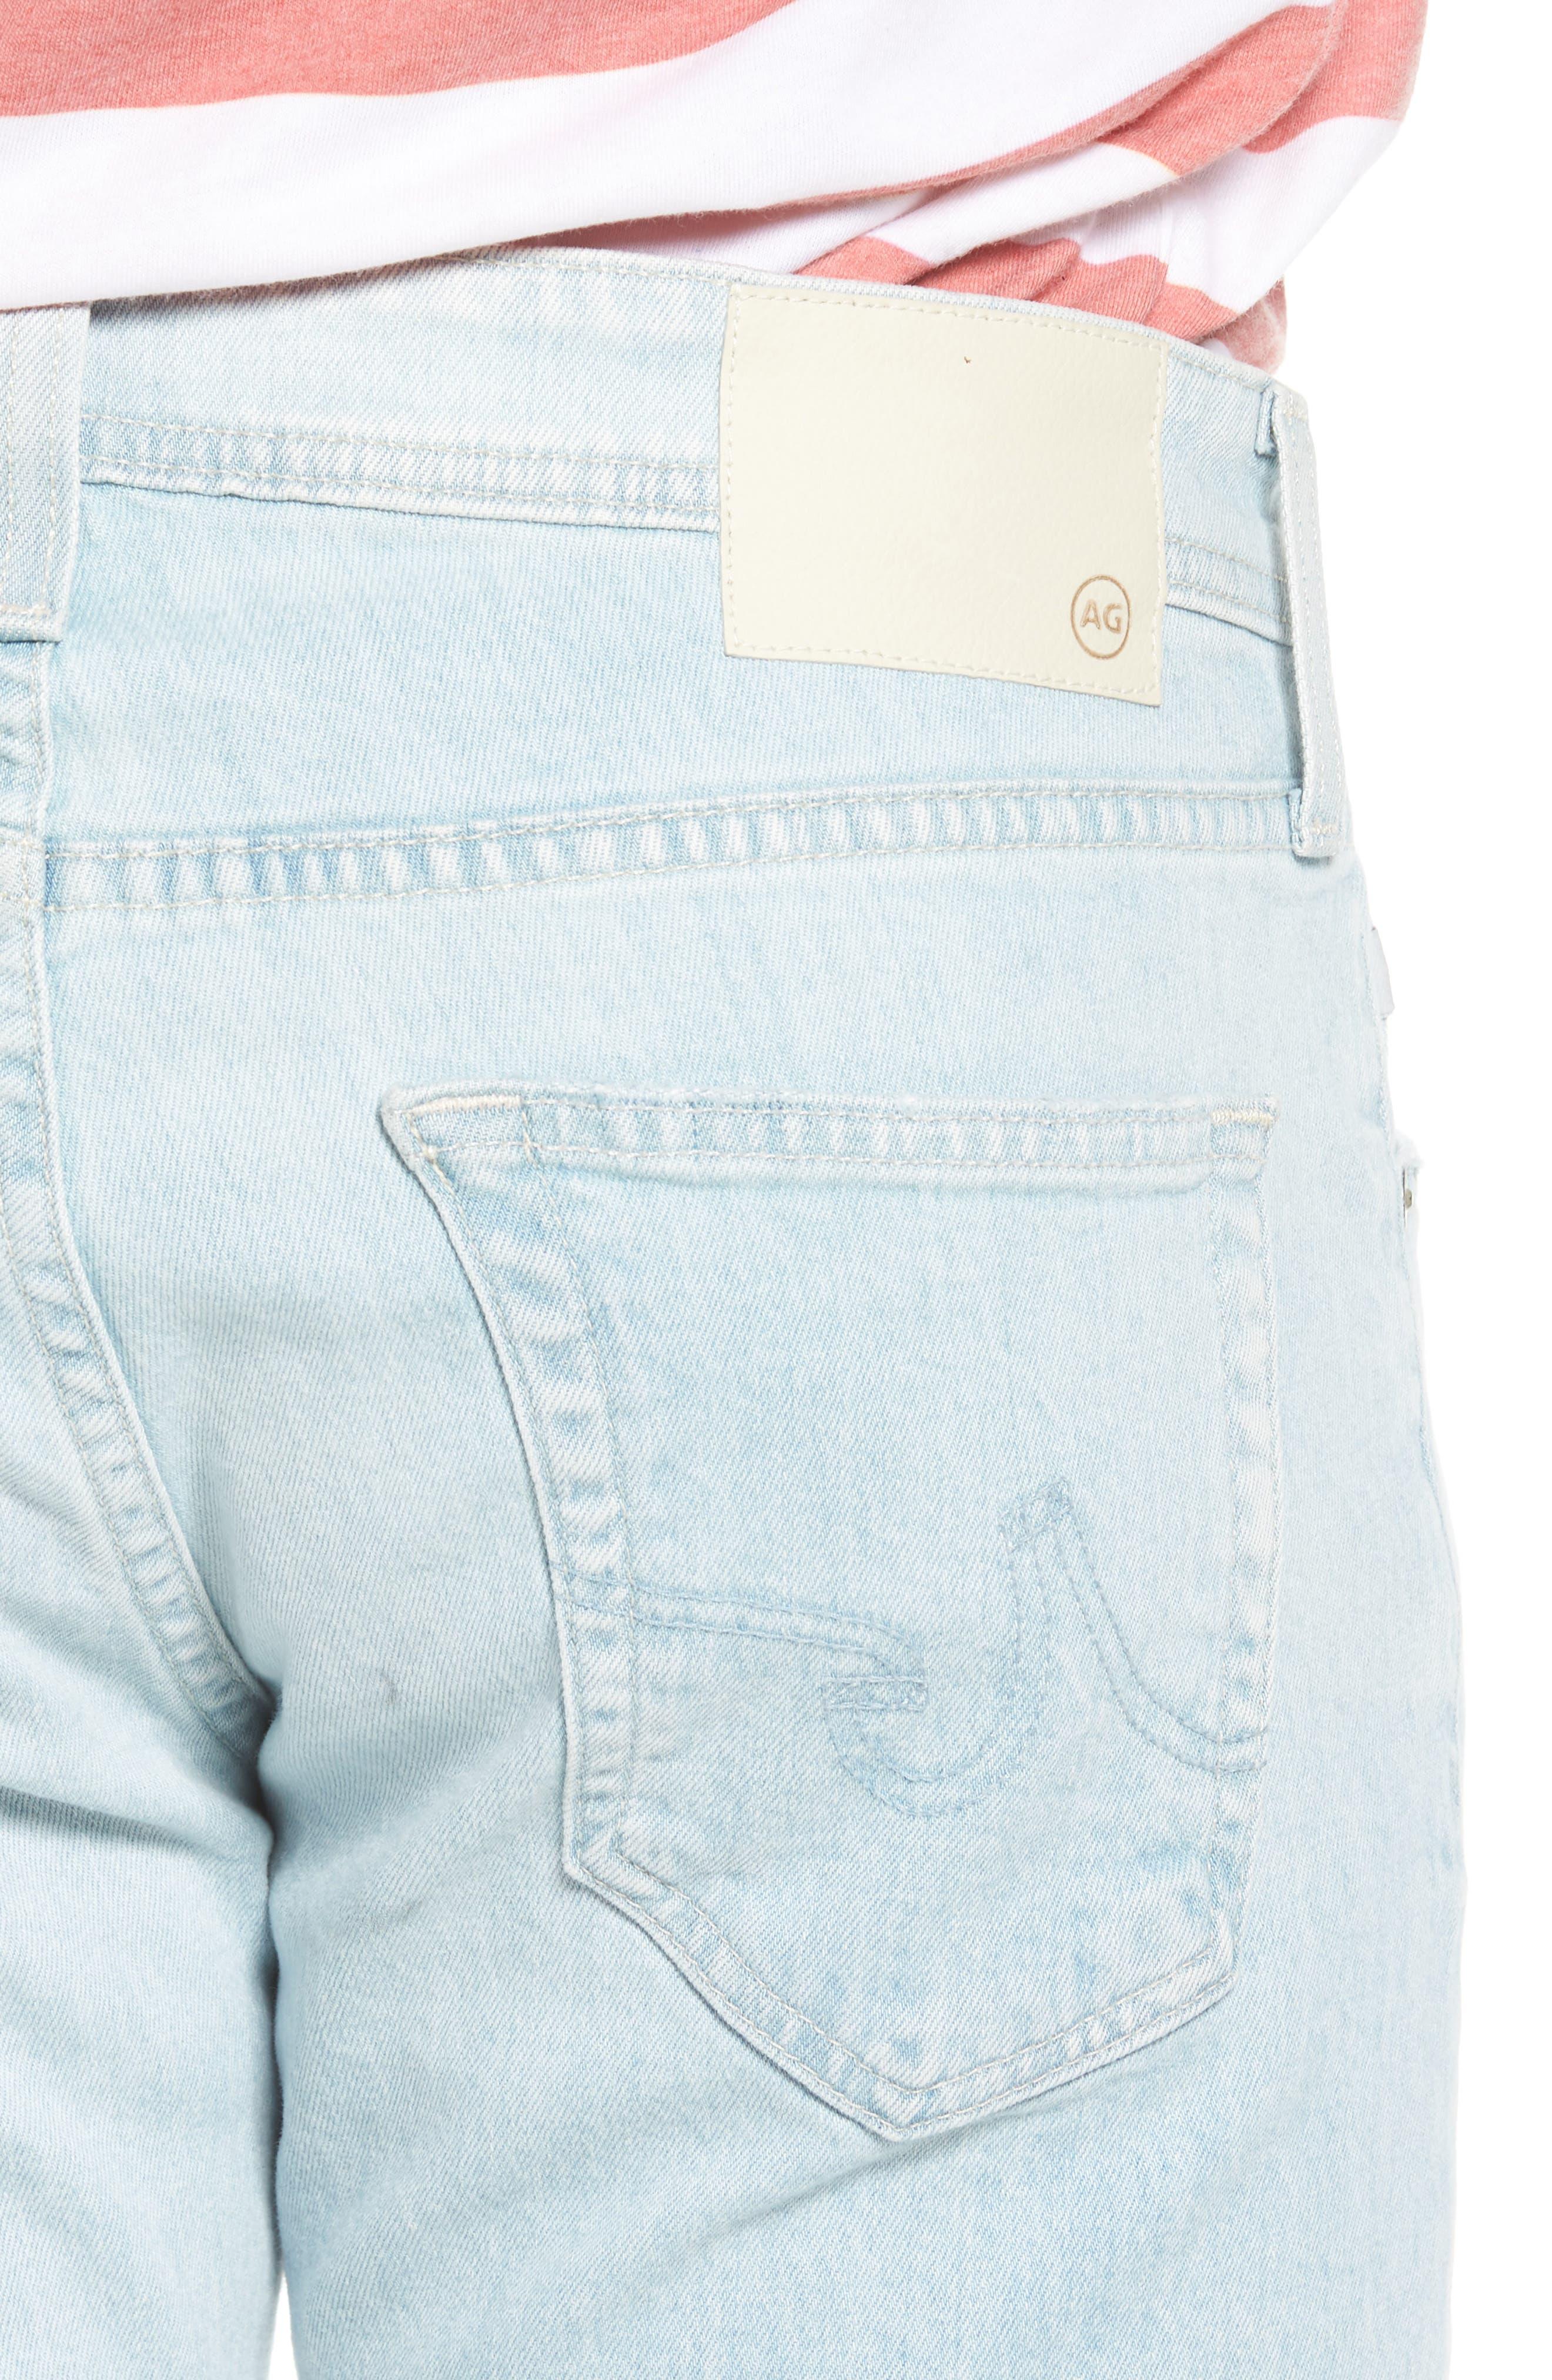 Dylan Skinny Fit Jeans,                             Alternate thumbnail 4, color,                             28 Years Salt Mist